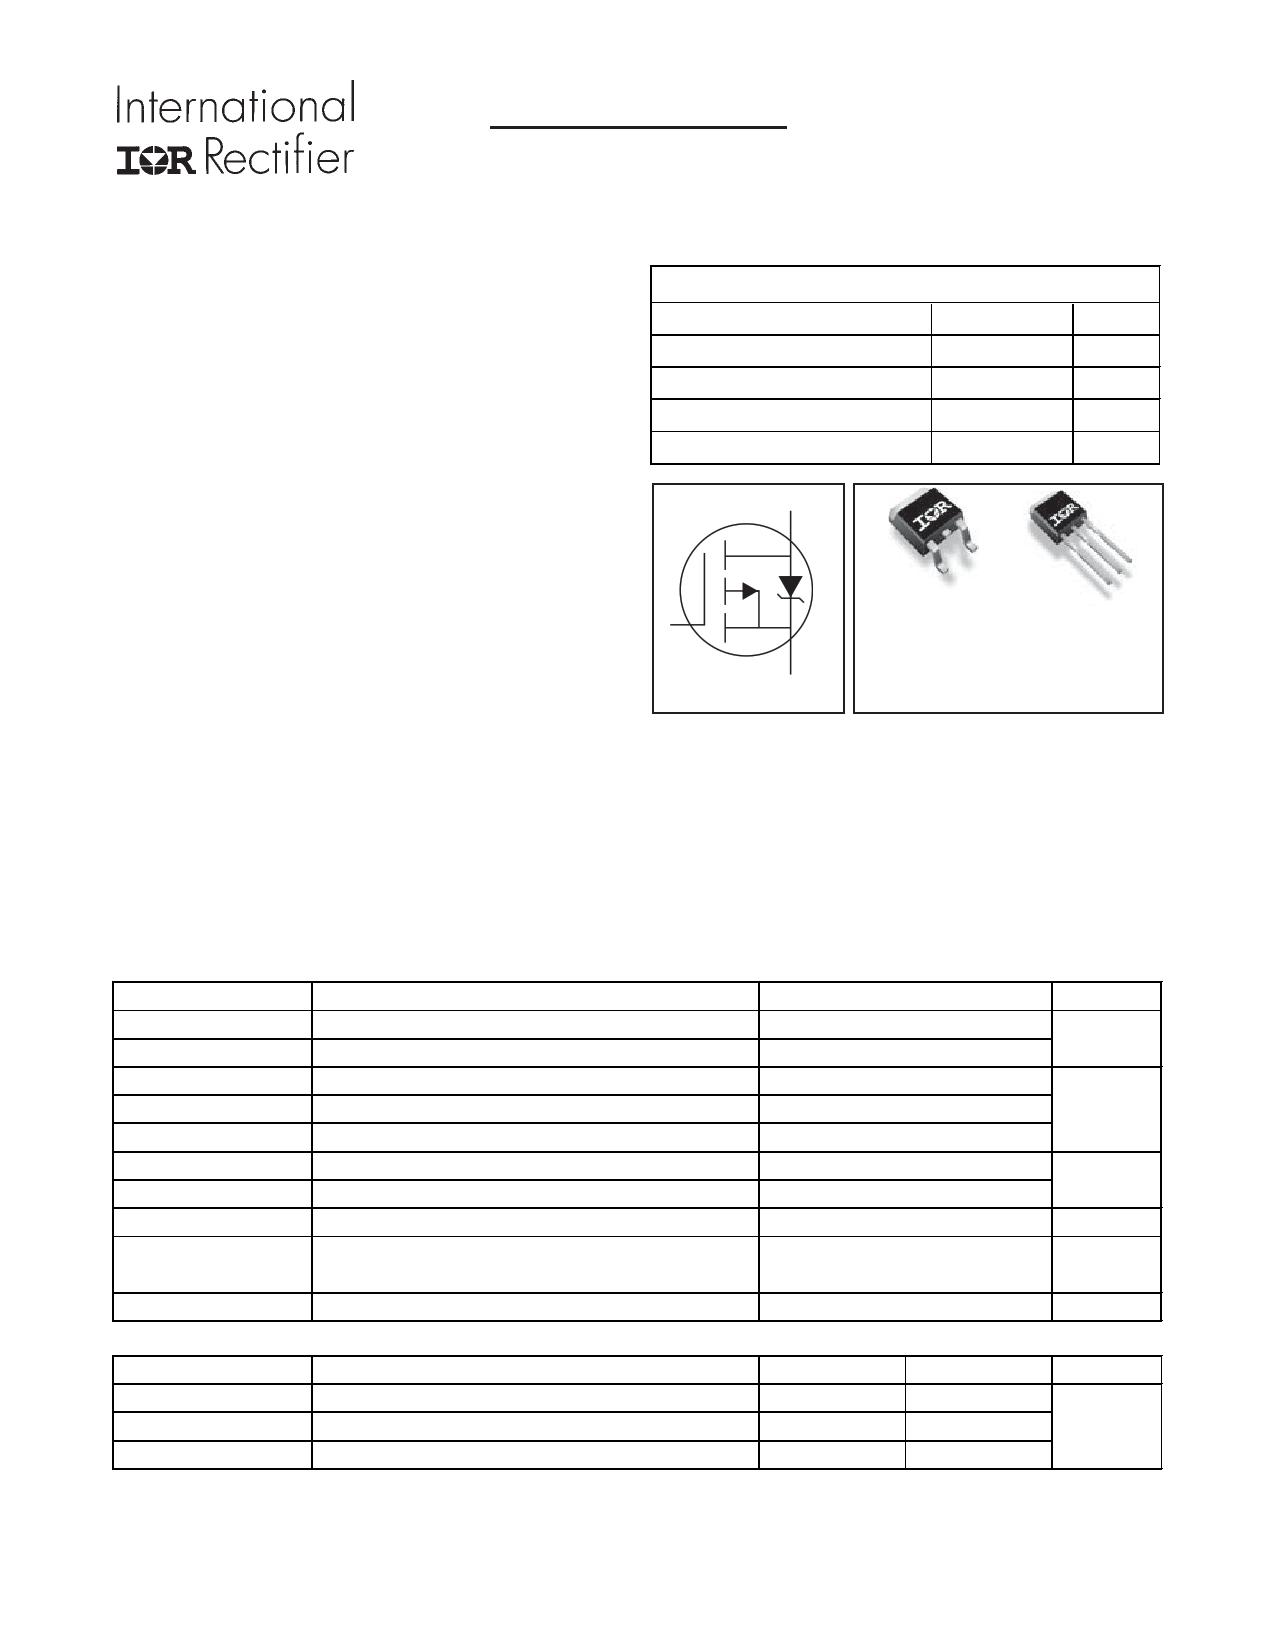 IRLU9343-701 Datasheet, IRLU9343-701 PDF,ピン配置, 機能